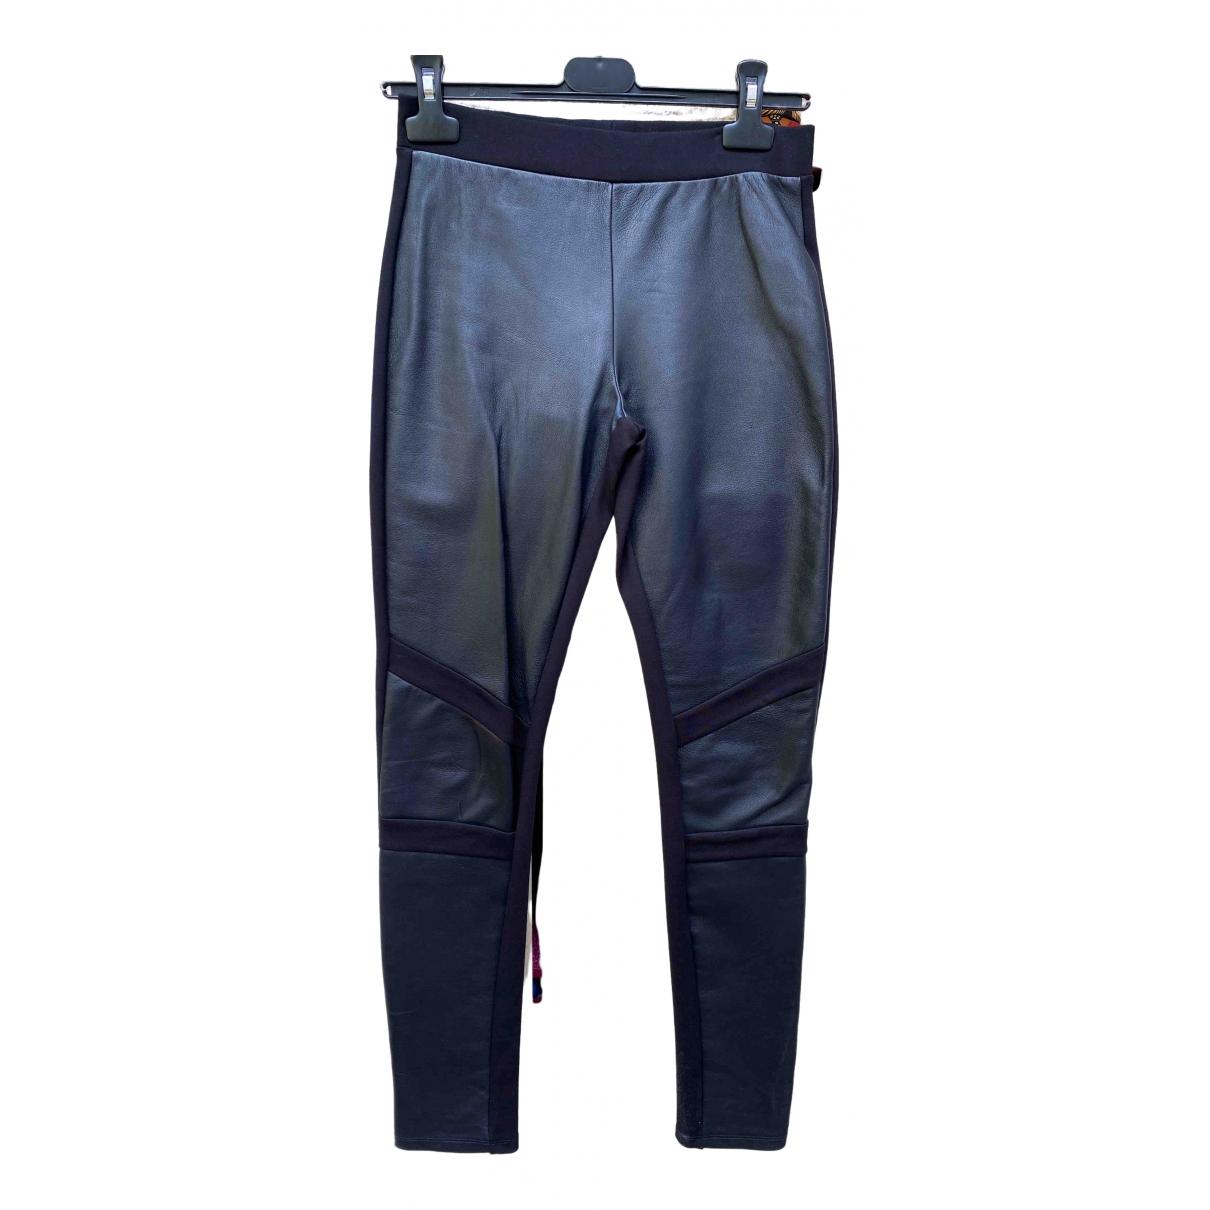 Zapa \N Black Leather Trousers for Women XS International